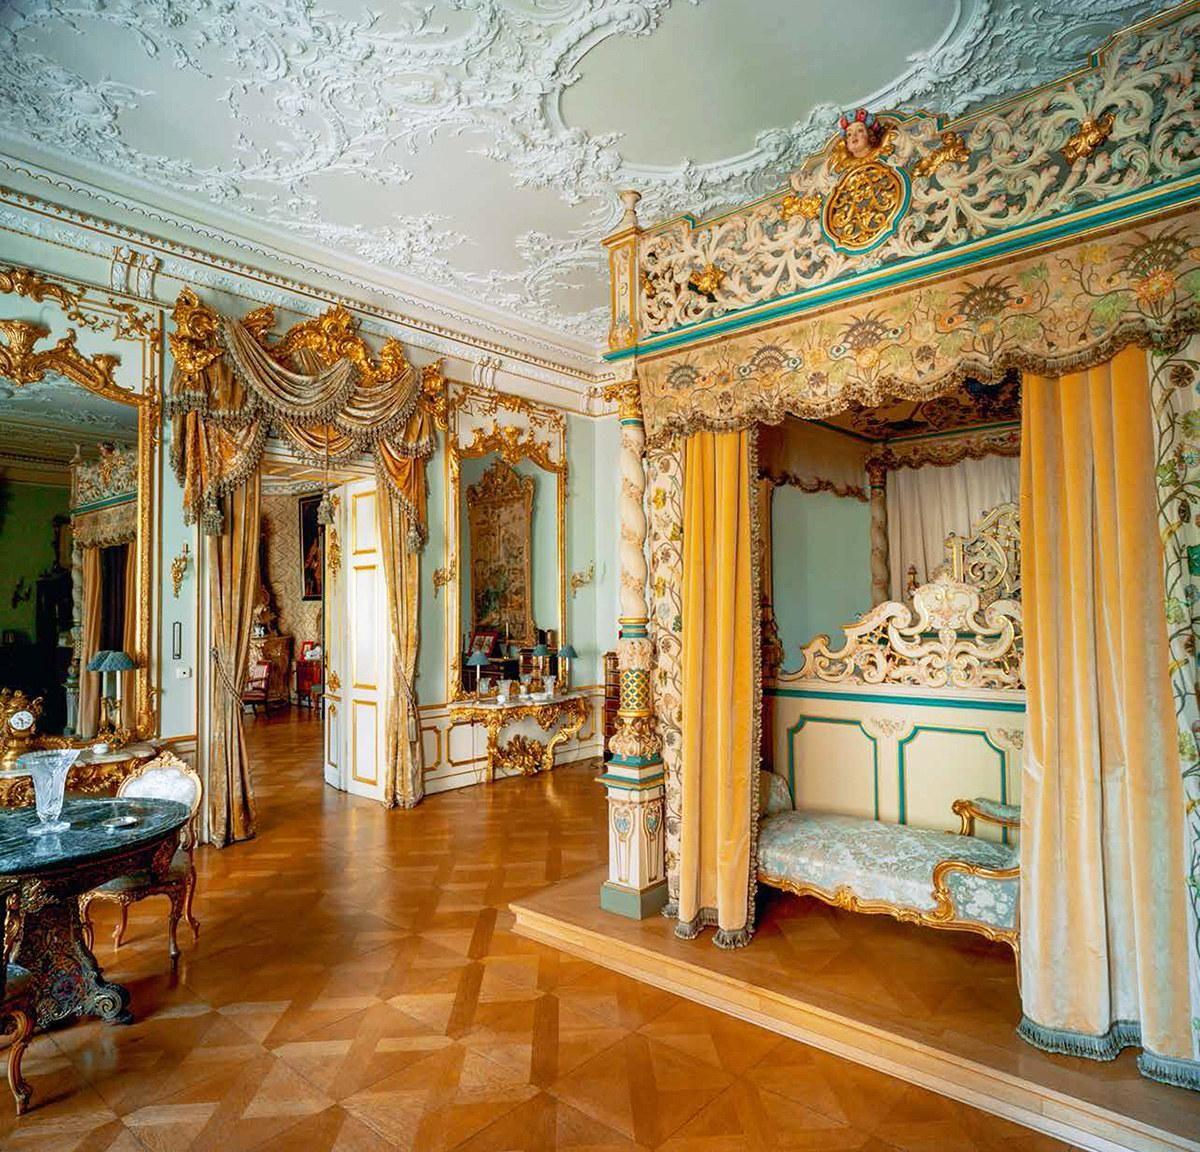 Tour The 500-Room Schloss St. Emmeram Estate In Germany